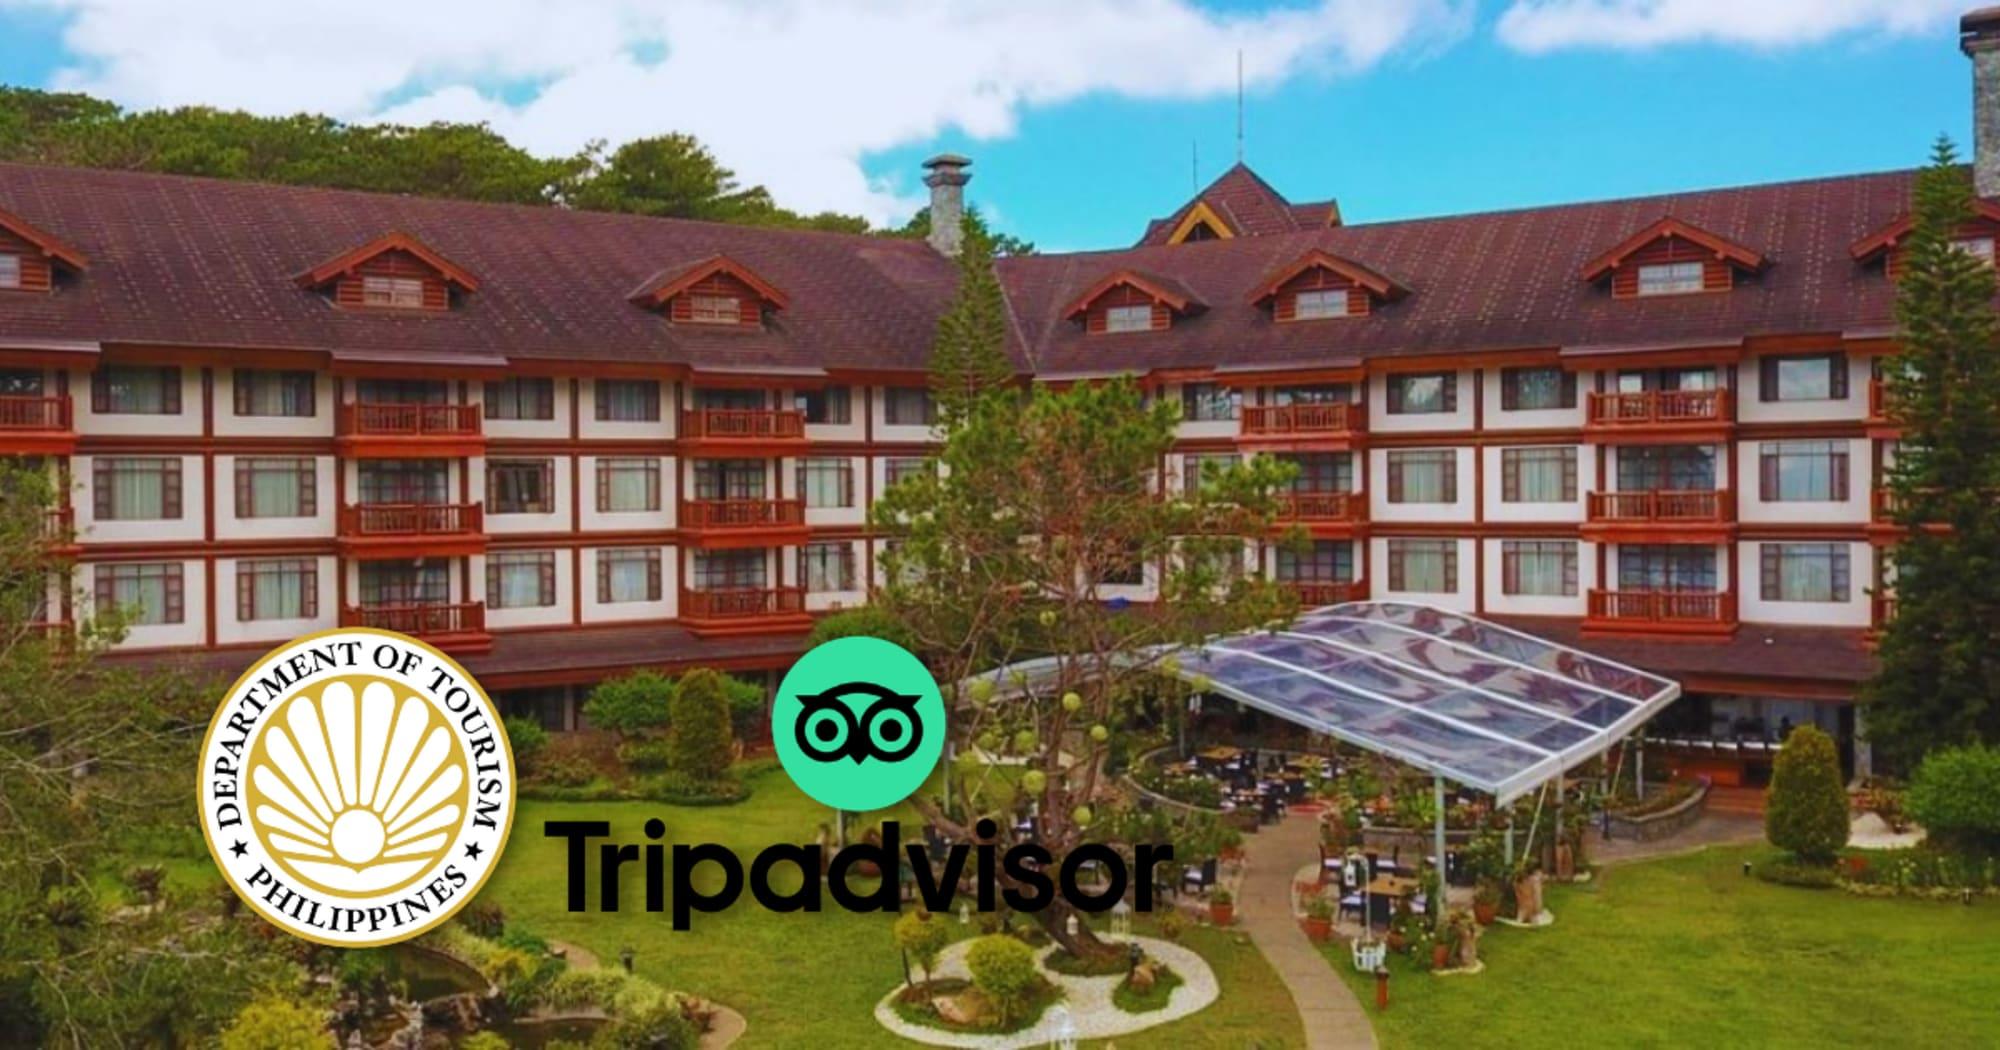 DOT congratulates the local hotels who bagged the 2021 Tripadvisor Awards